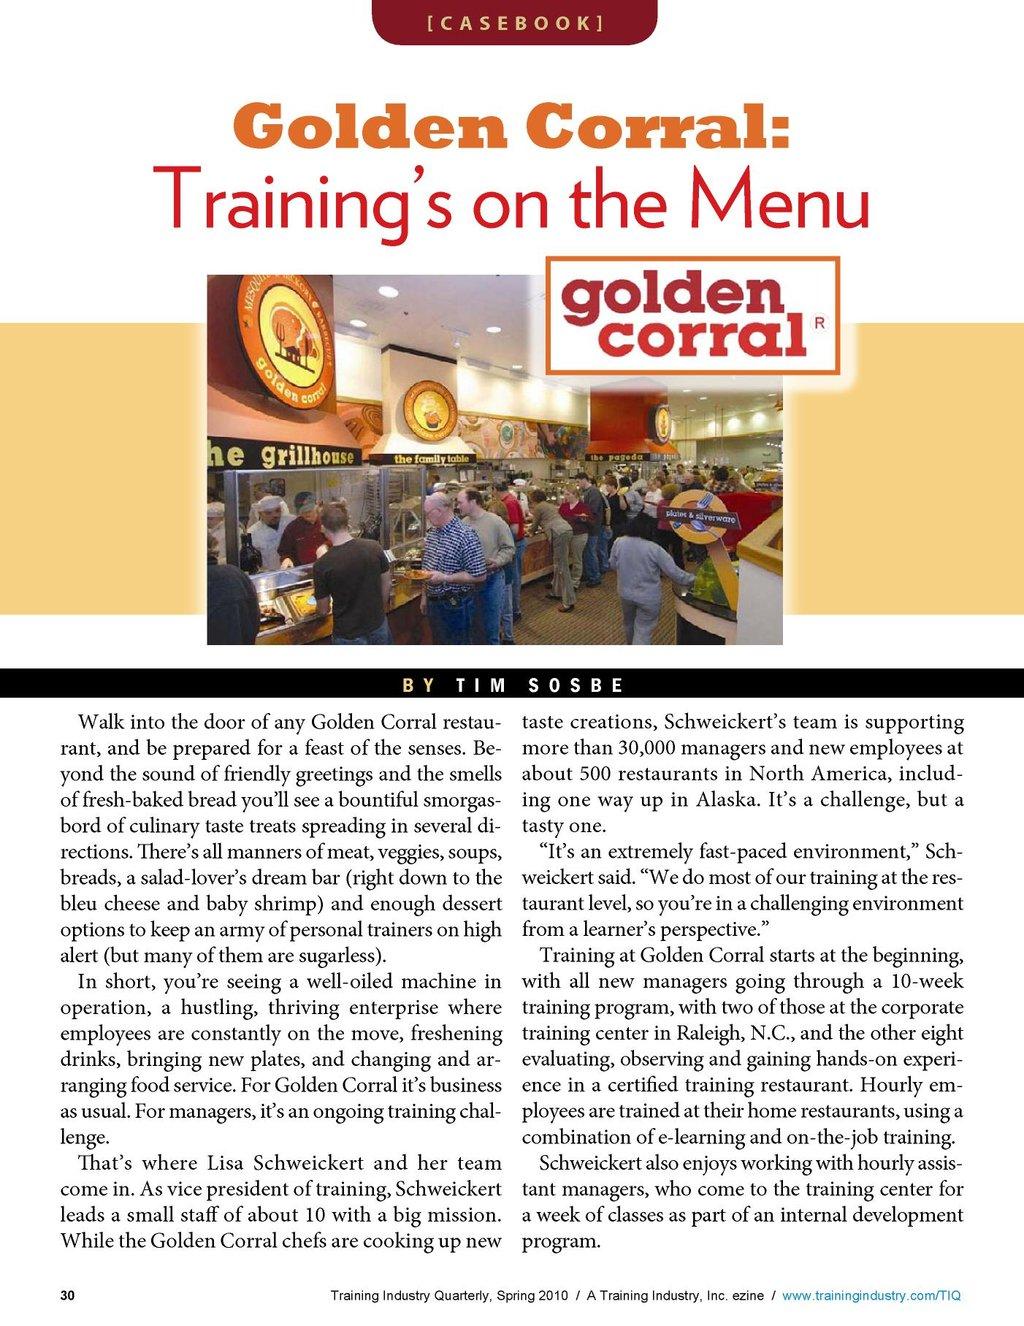 Training Industry Quarterly - Spring 2010